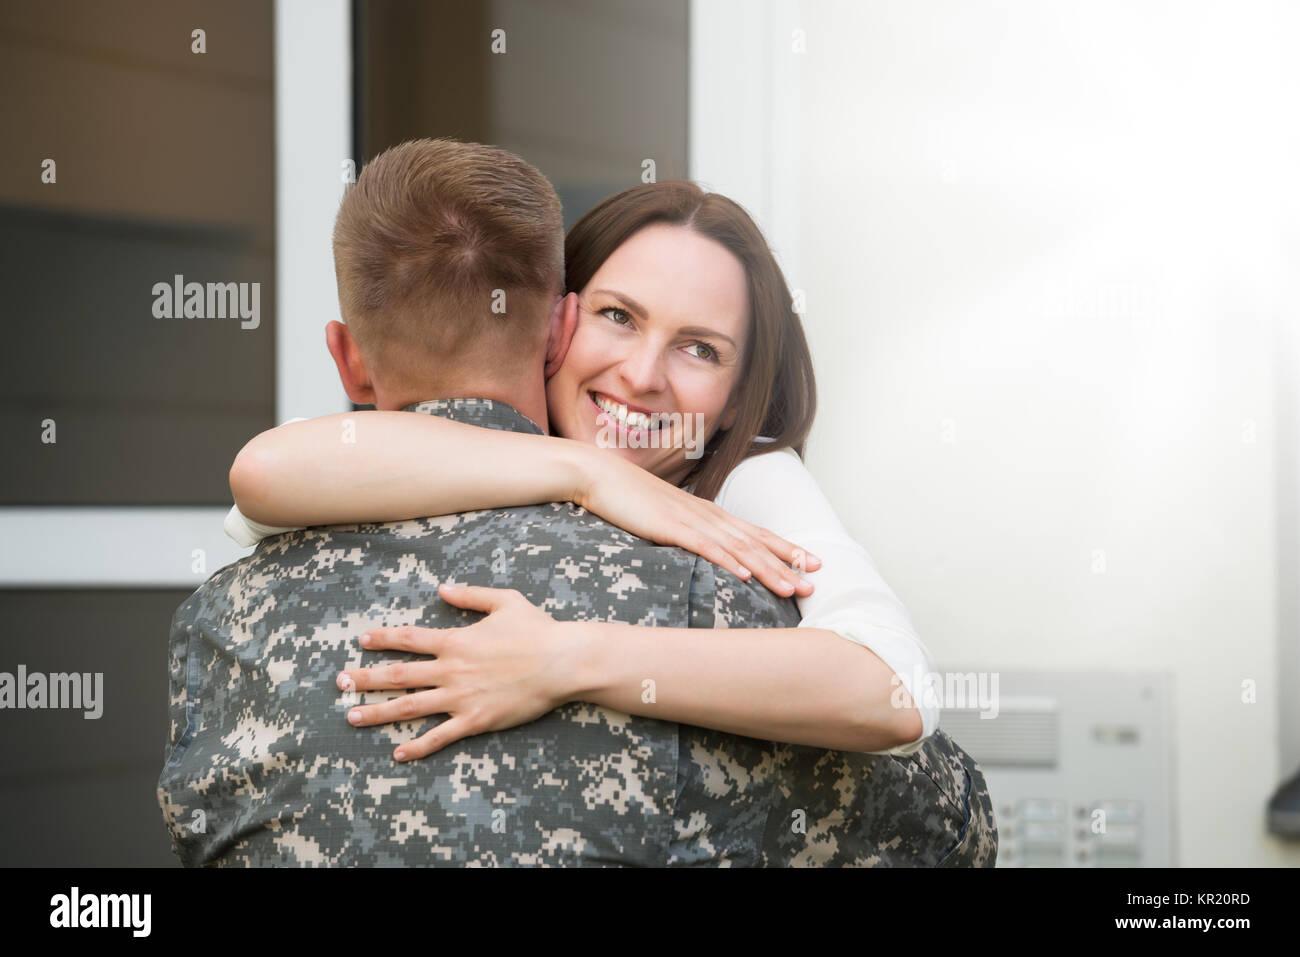 Happy Wife Hugging Her Husband - Stock Image